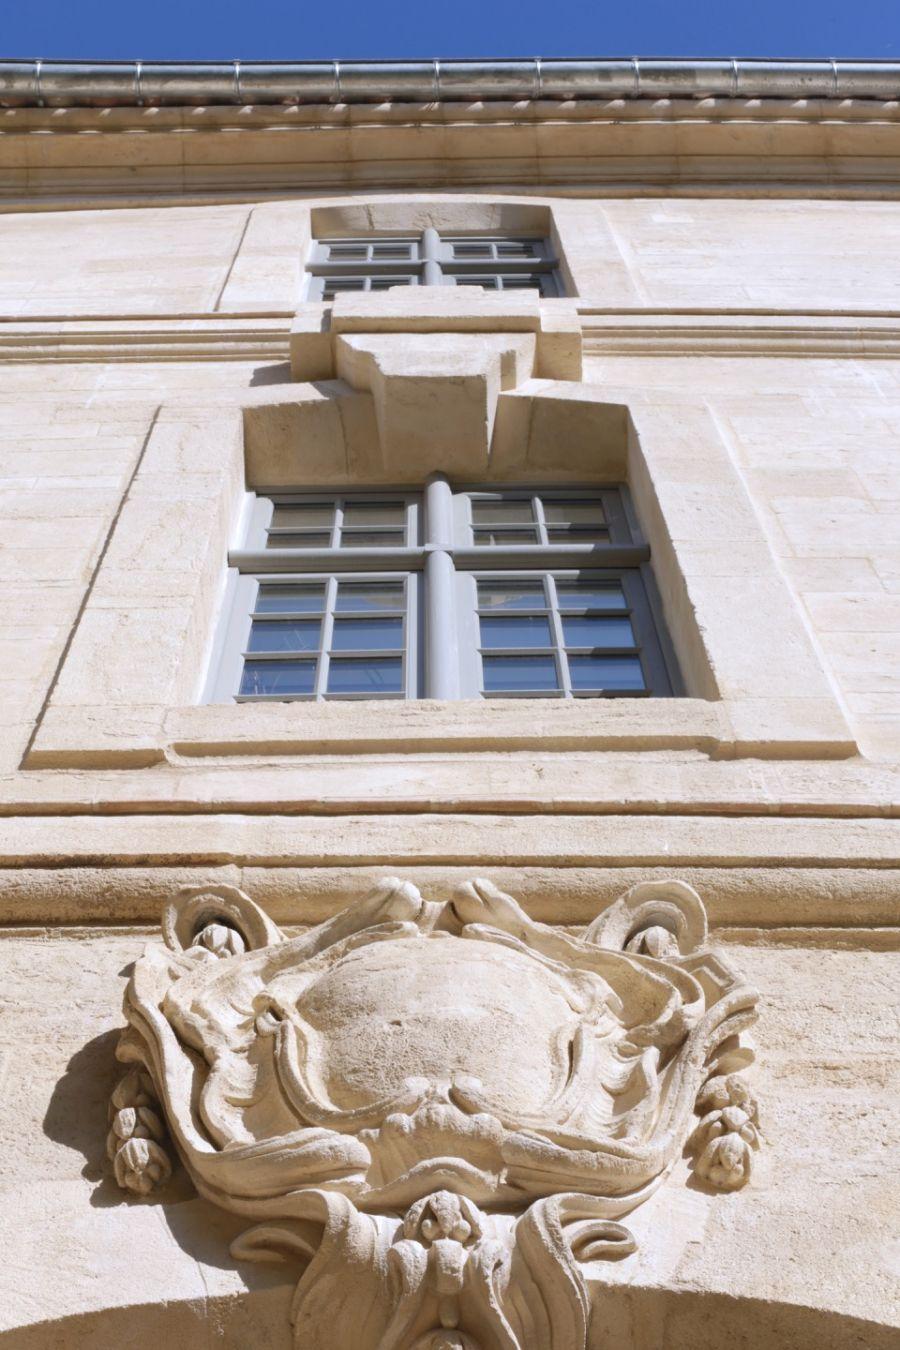 Campus Saint-Charles - Arch. Hellin-Sebbag - Photo : Jean-Pierre Porcher